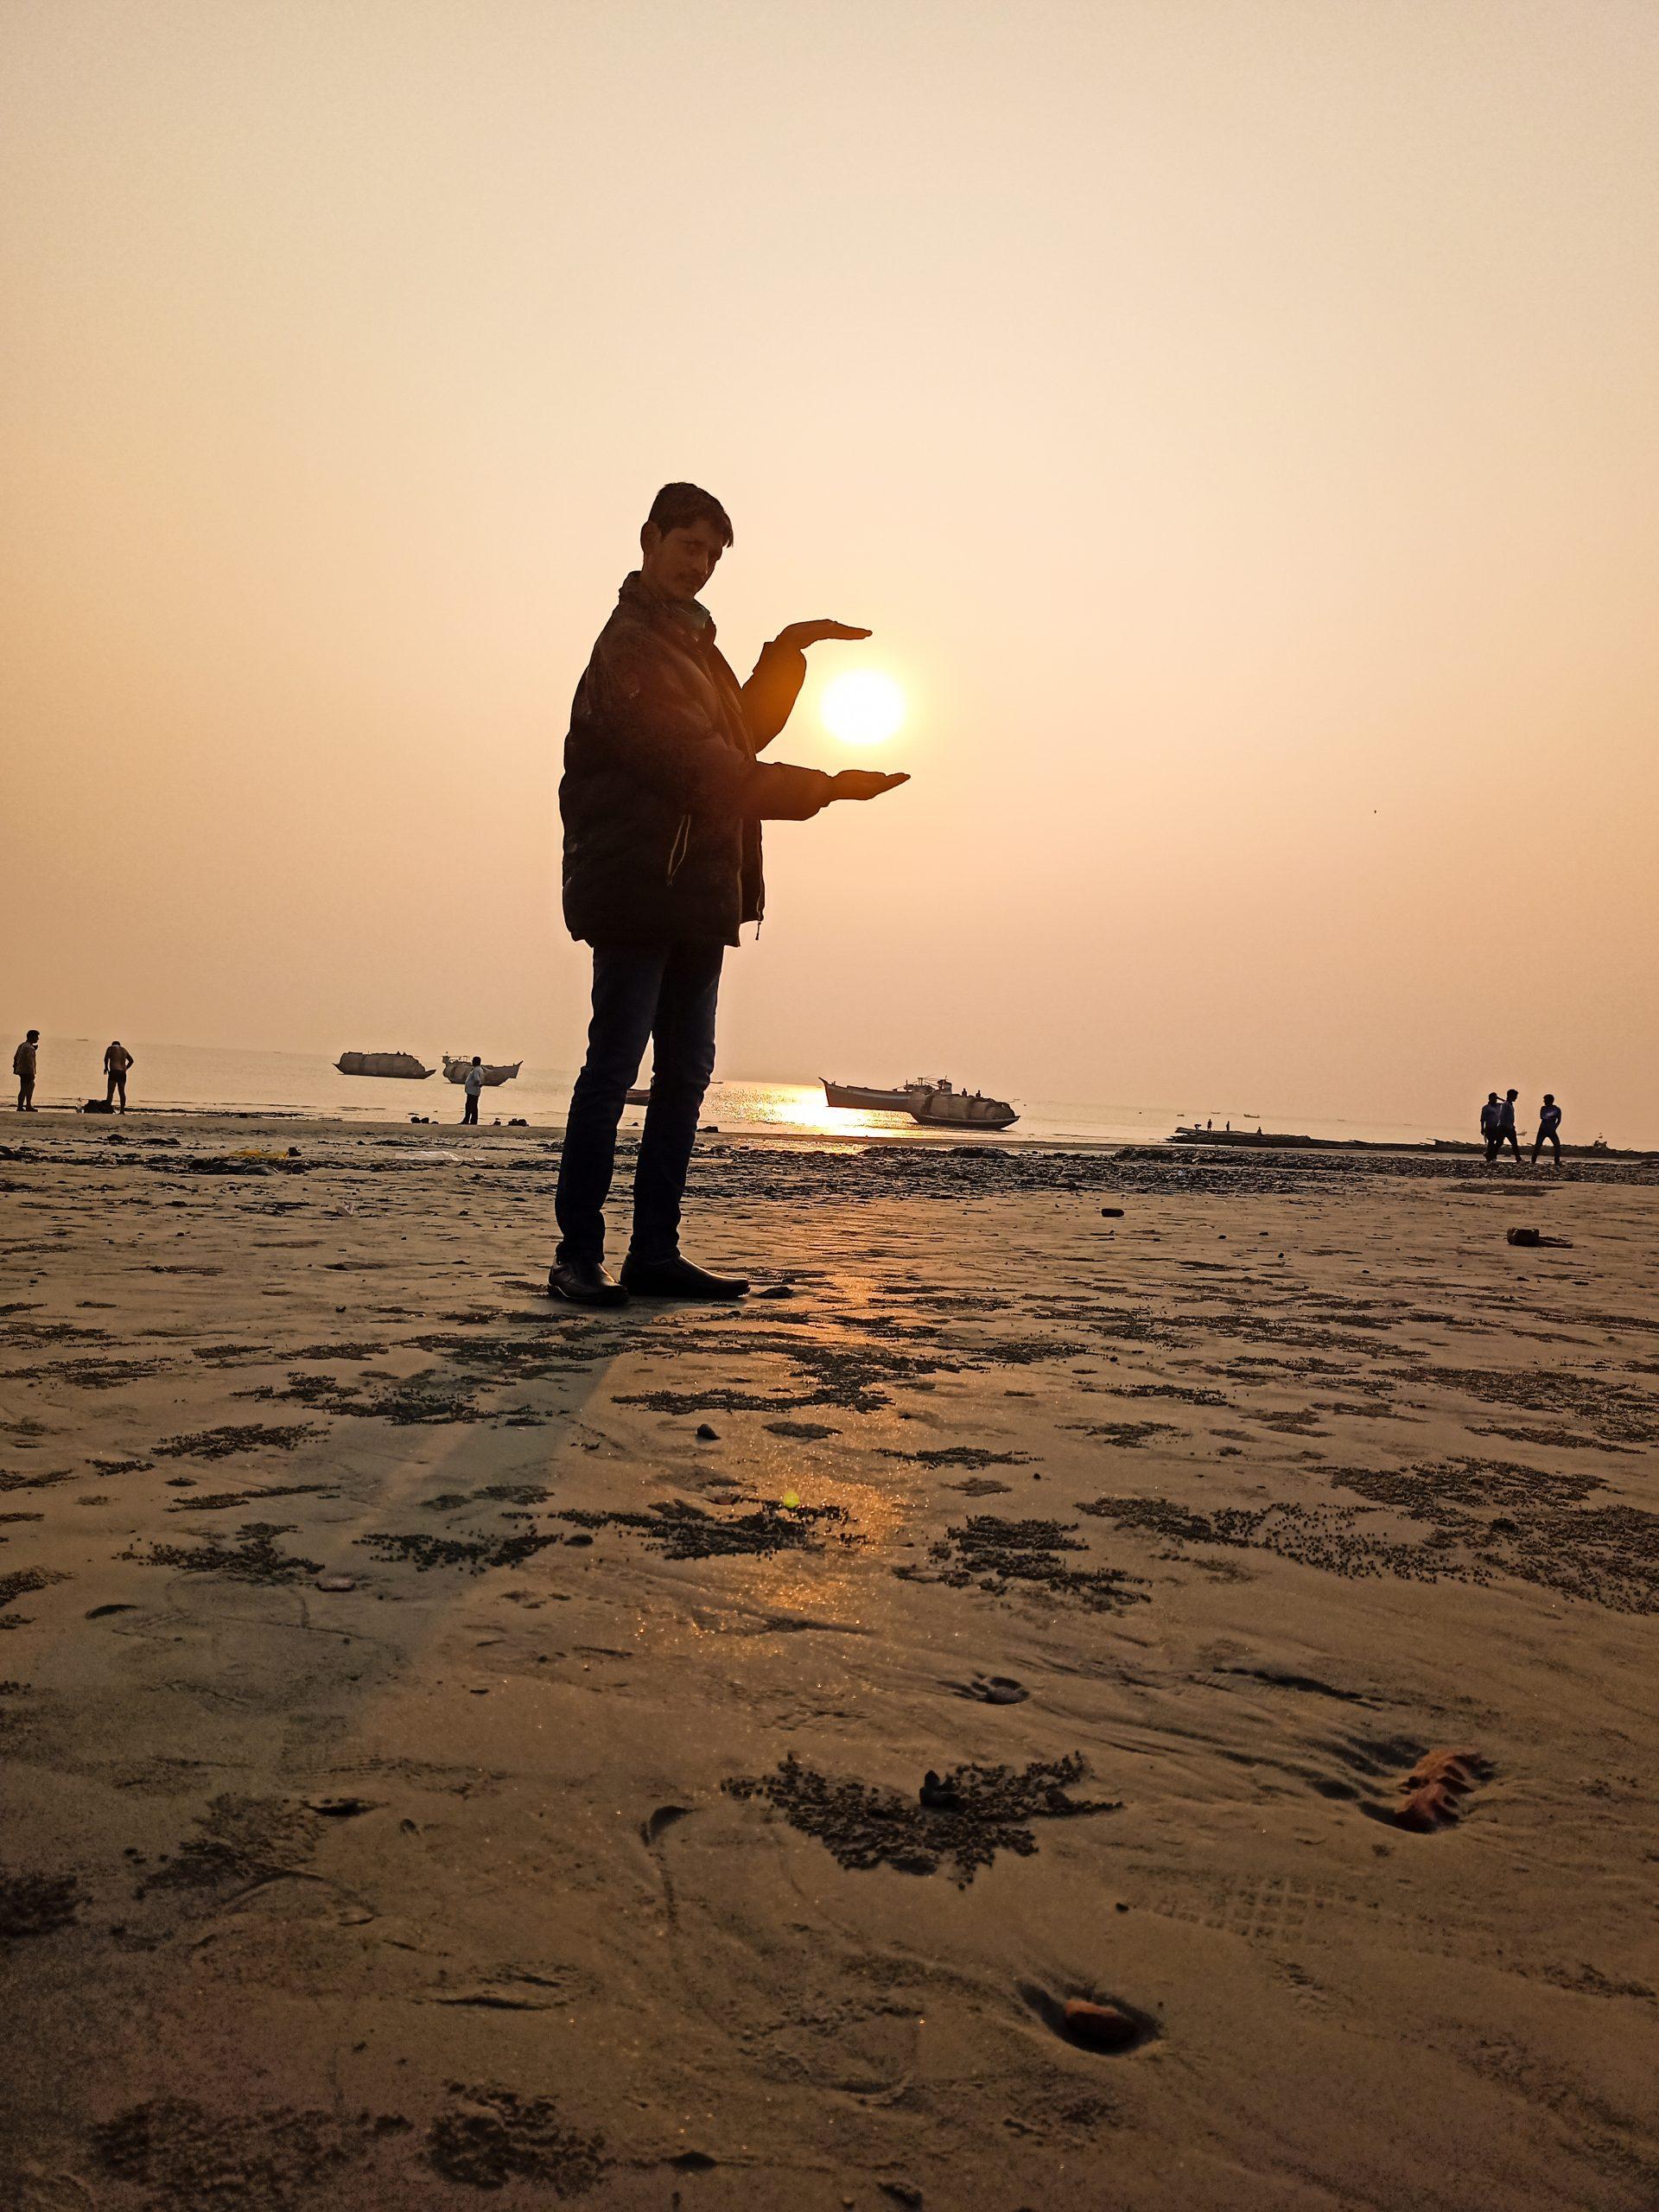 Showing sun in hands